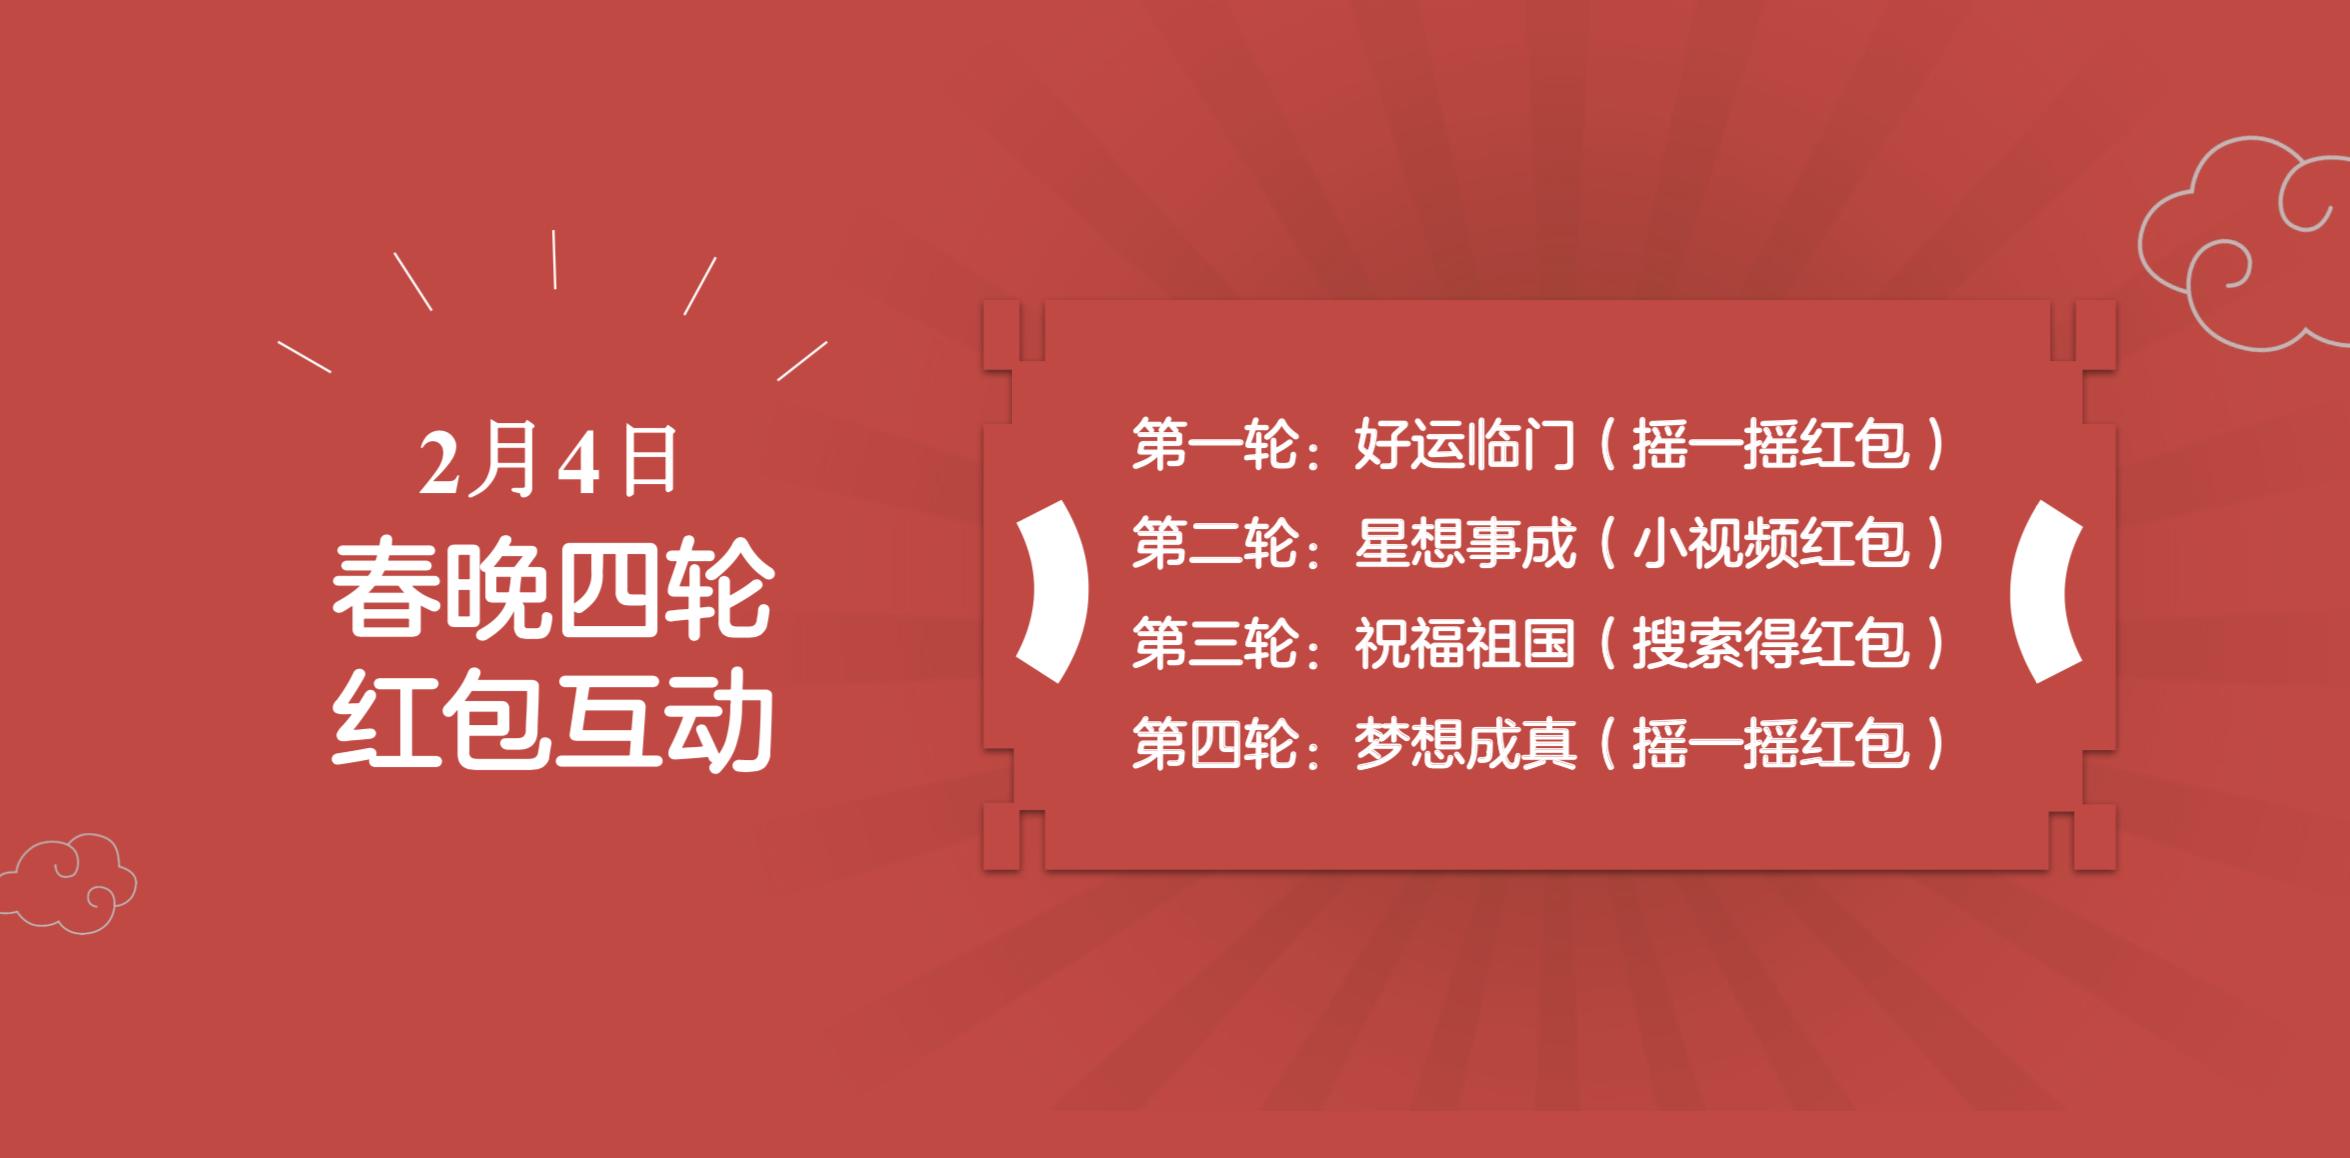 BAT春节红包攻略:年年岁岁发红包 岁岁年年有不同